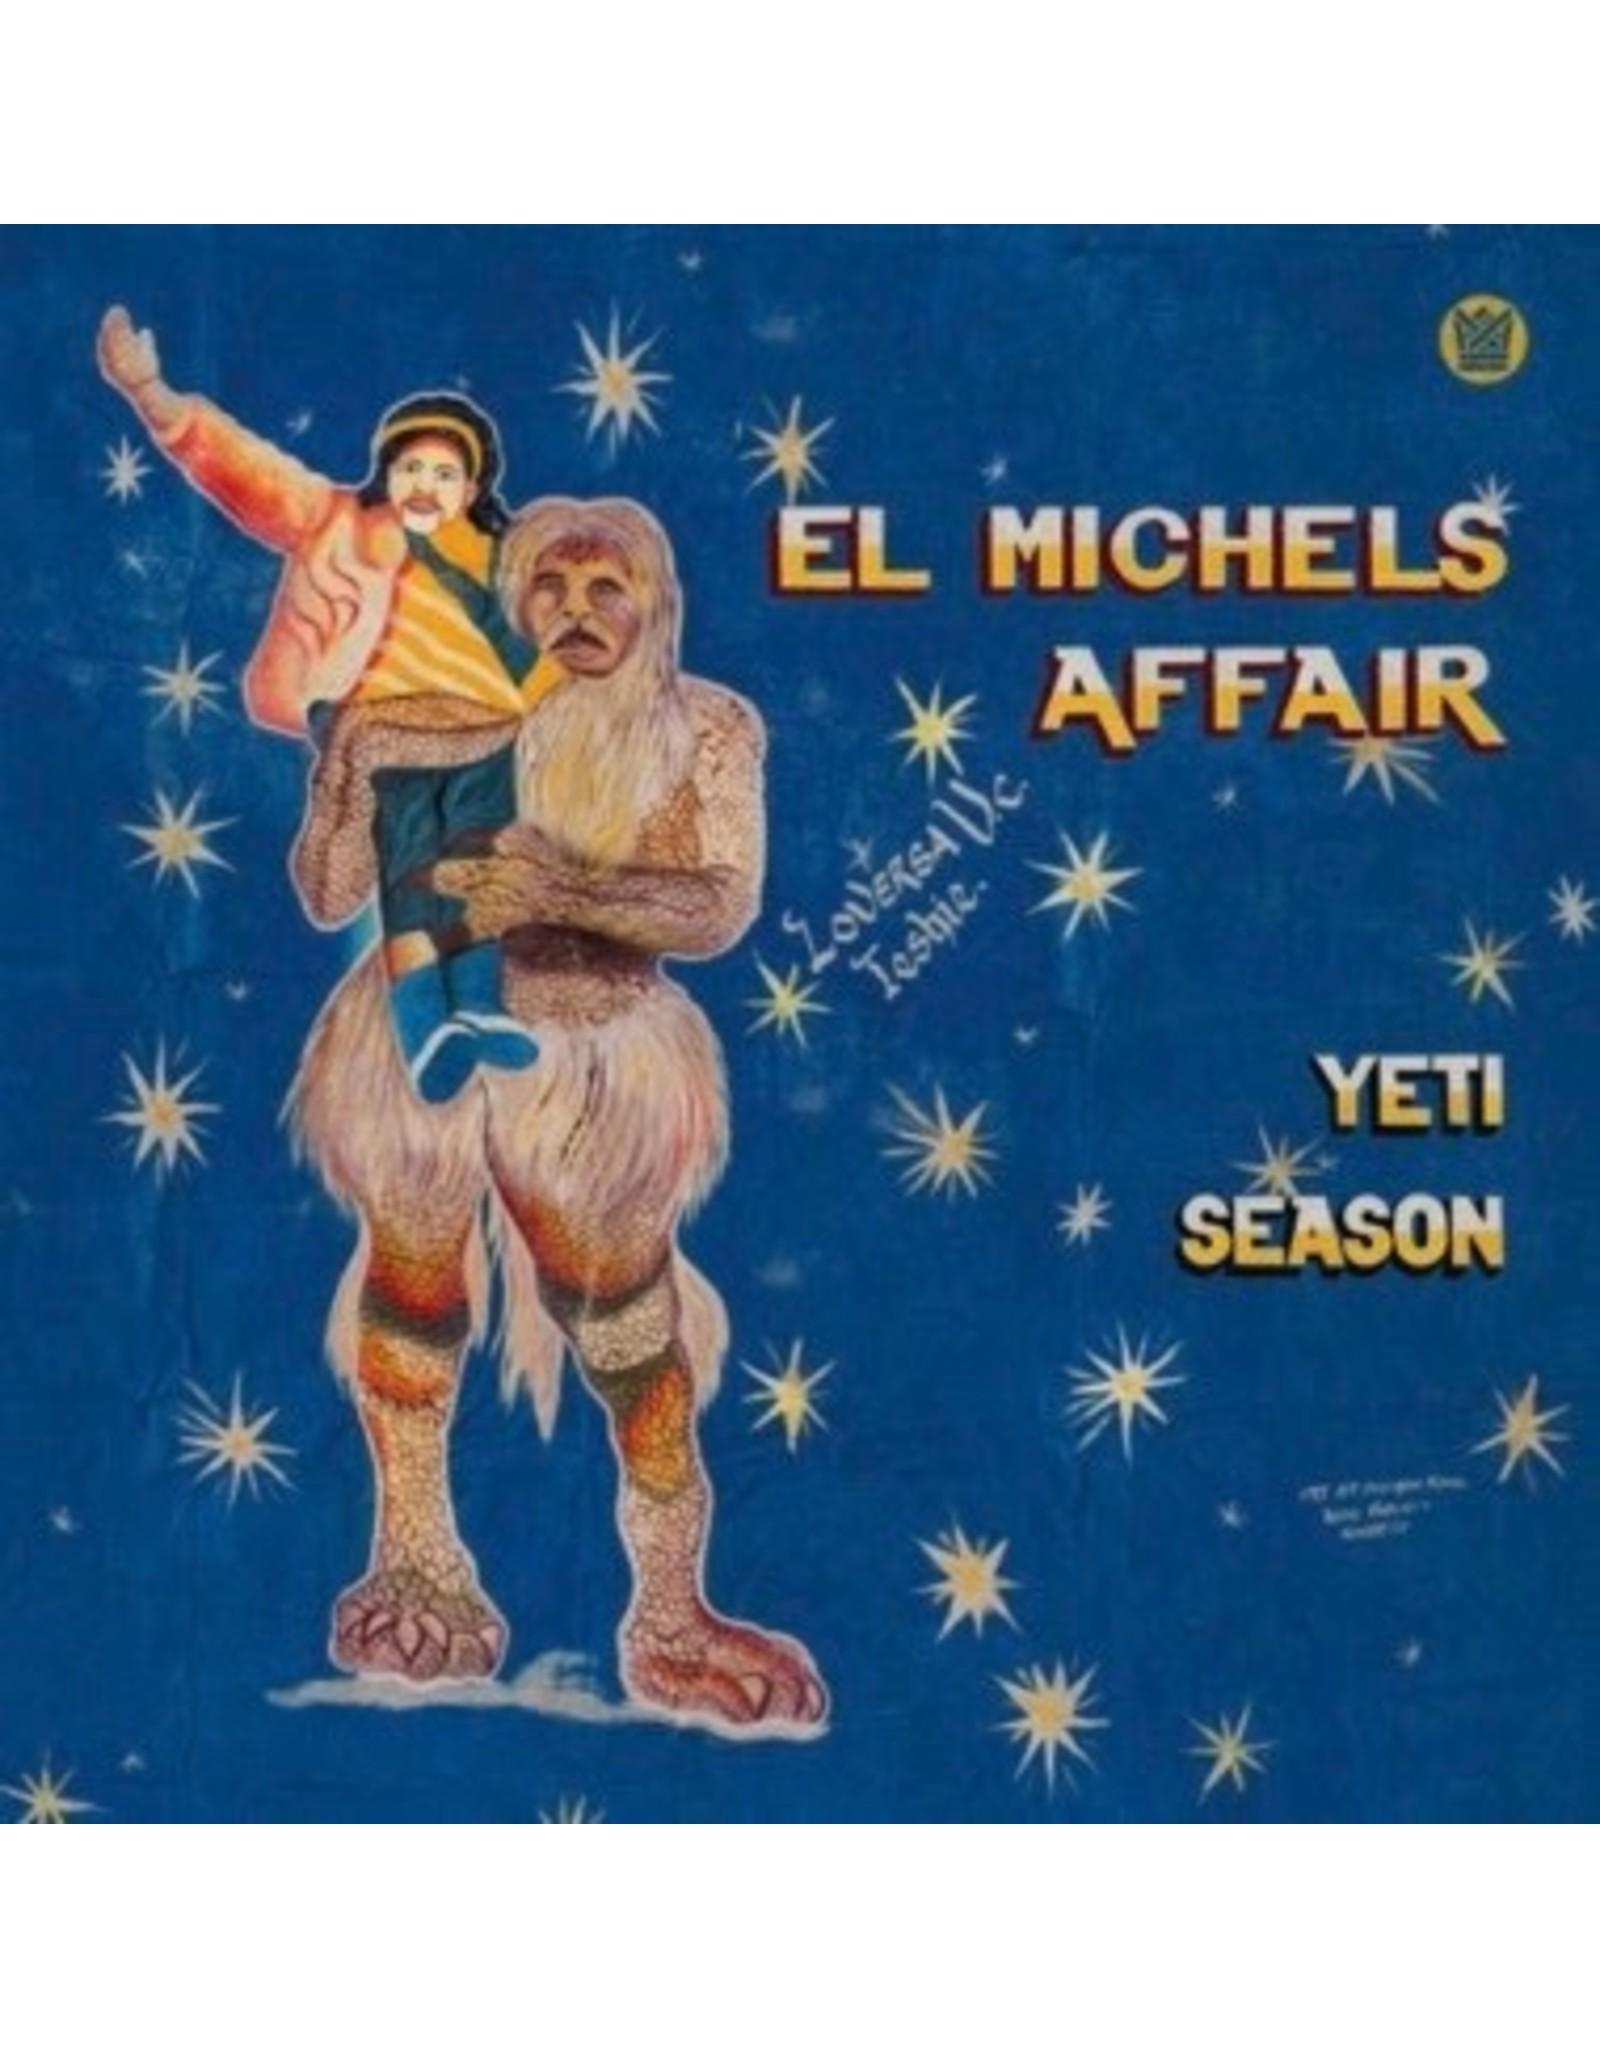 New Vinyl El Michels Affair - Yeti Season (Ltd., Colored) LP